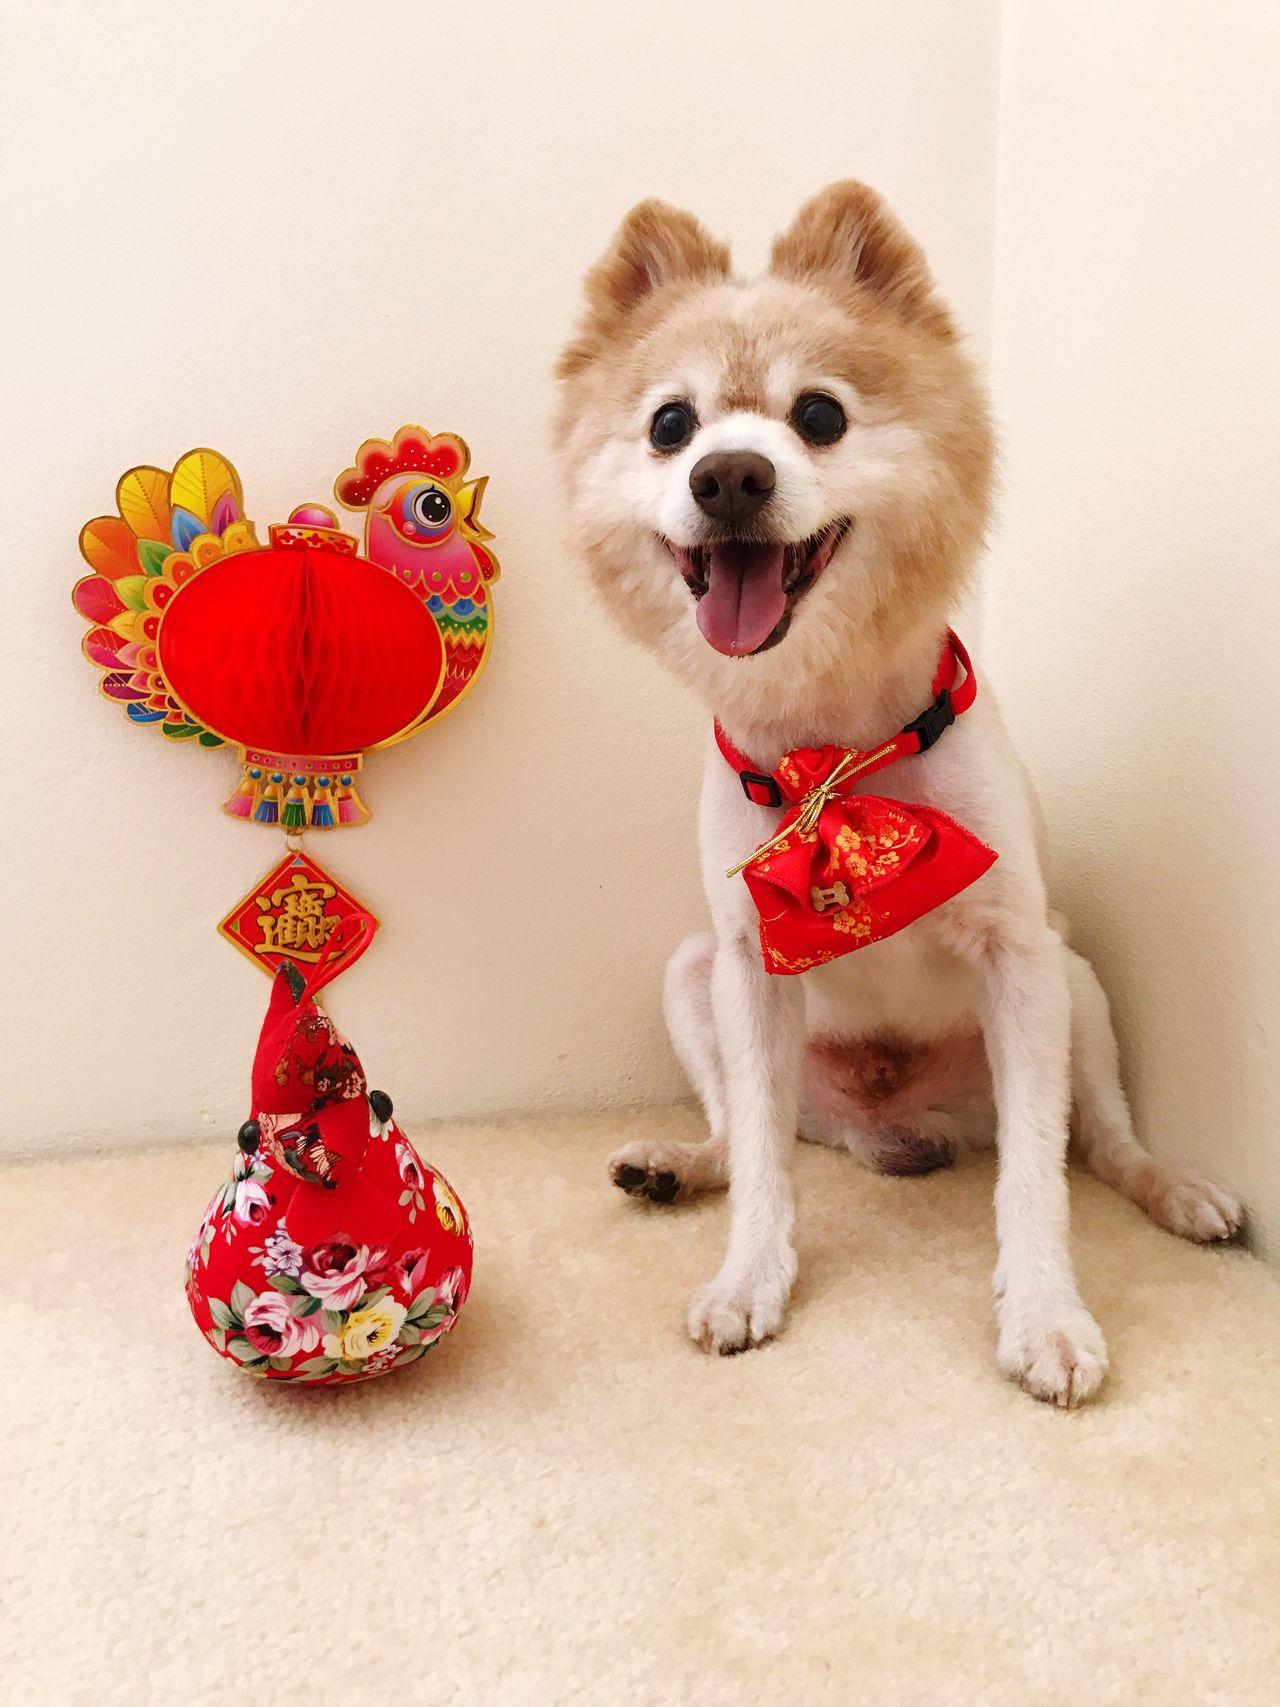 Happy Dog Lunar New Year Celebration | Dog Shotoniphone7plus